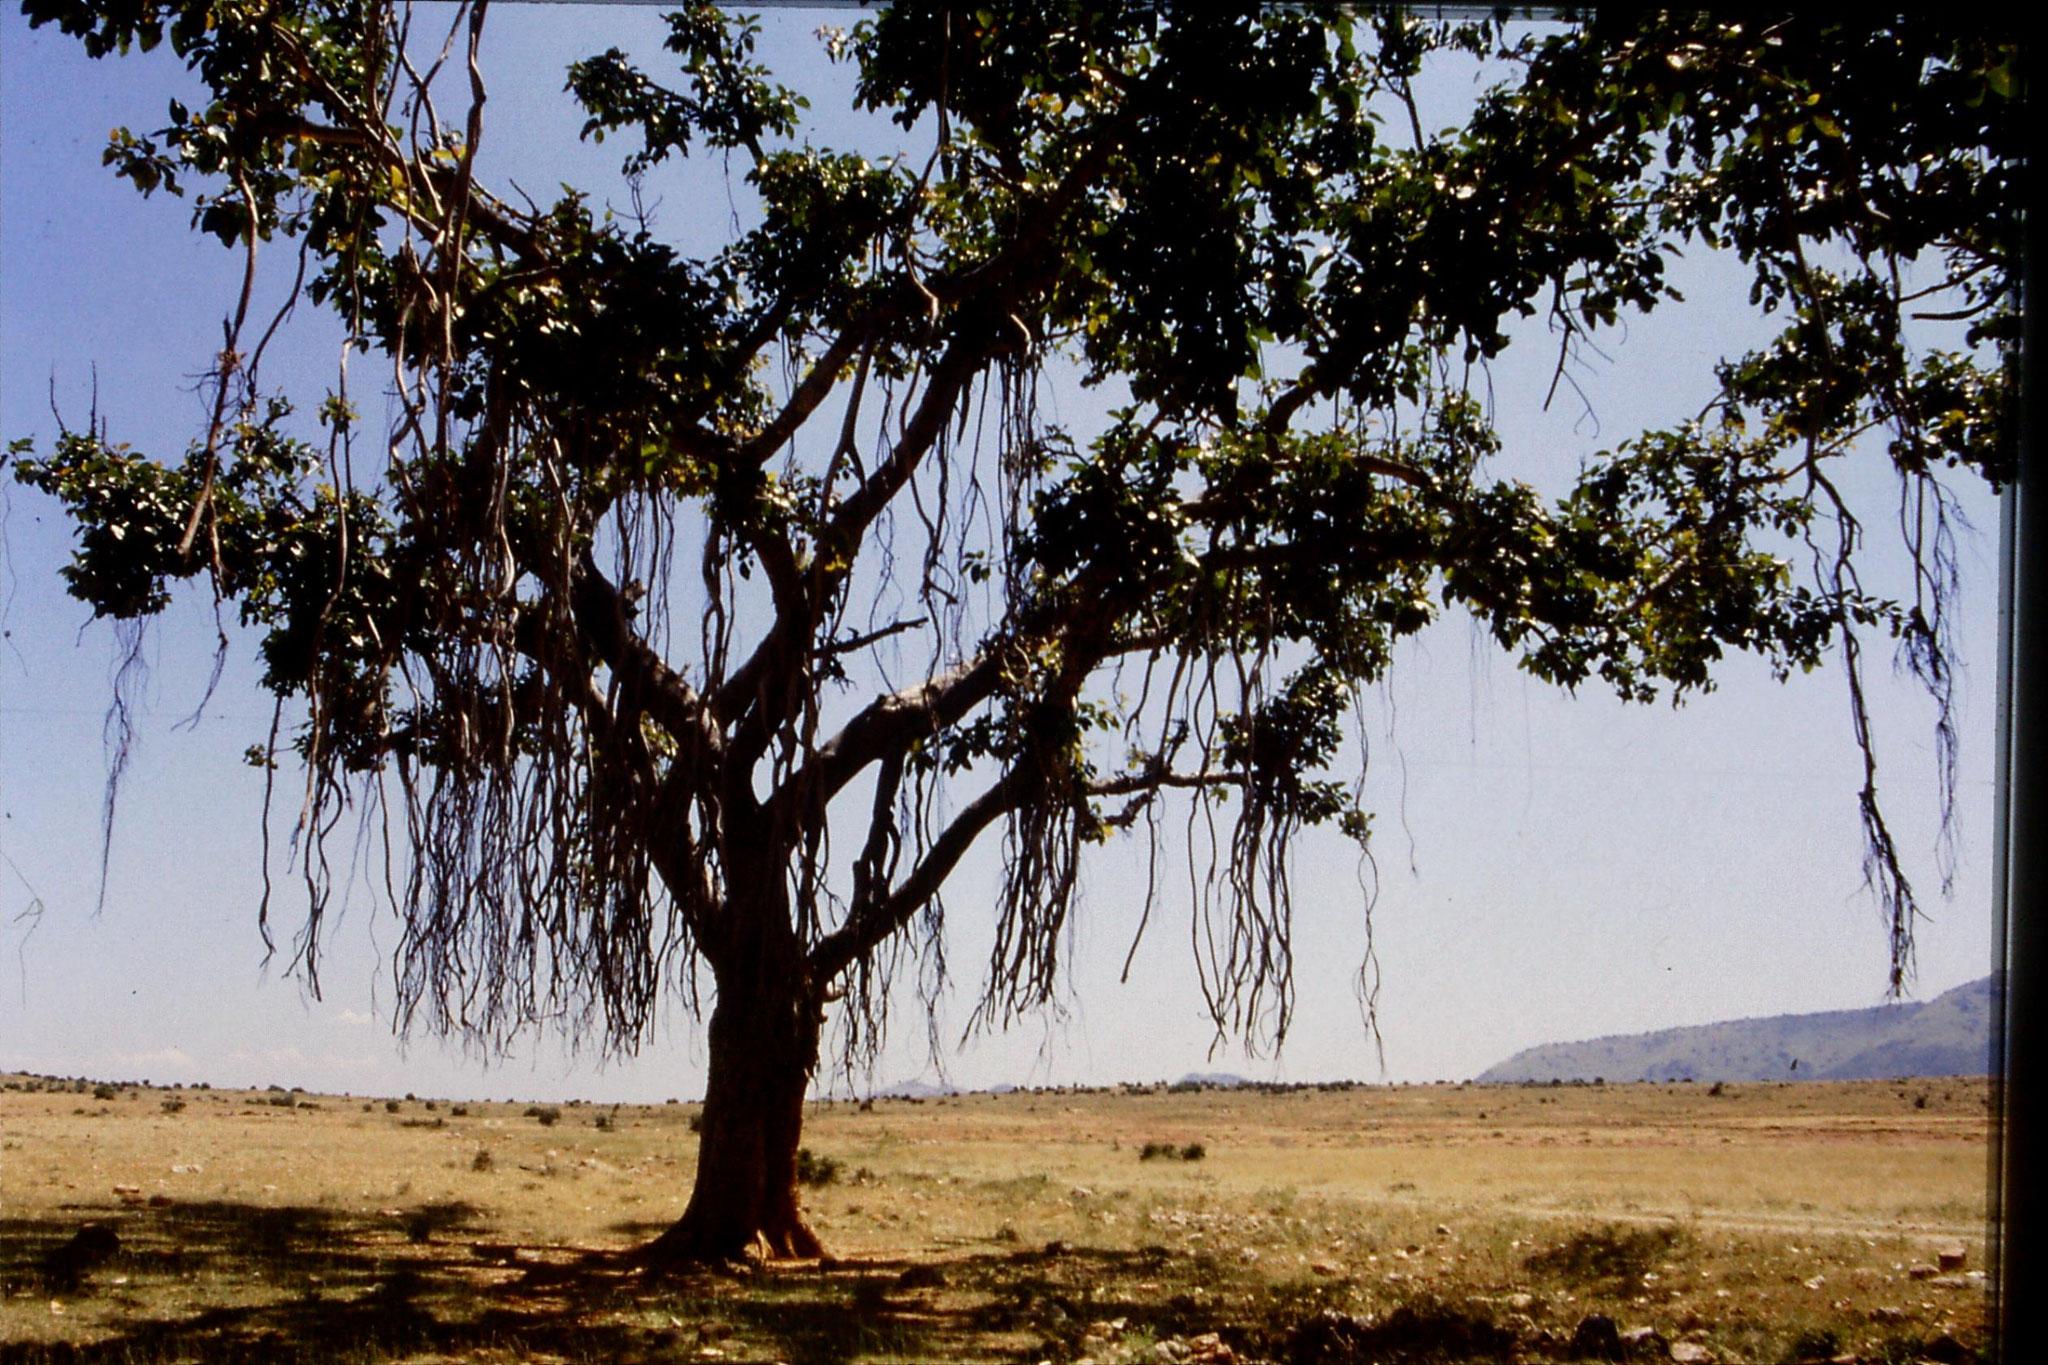 104/26: 21/2/1990 Batlagundi afforestation project